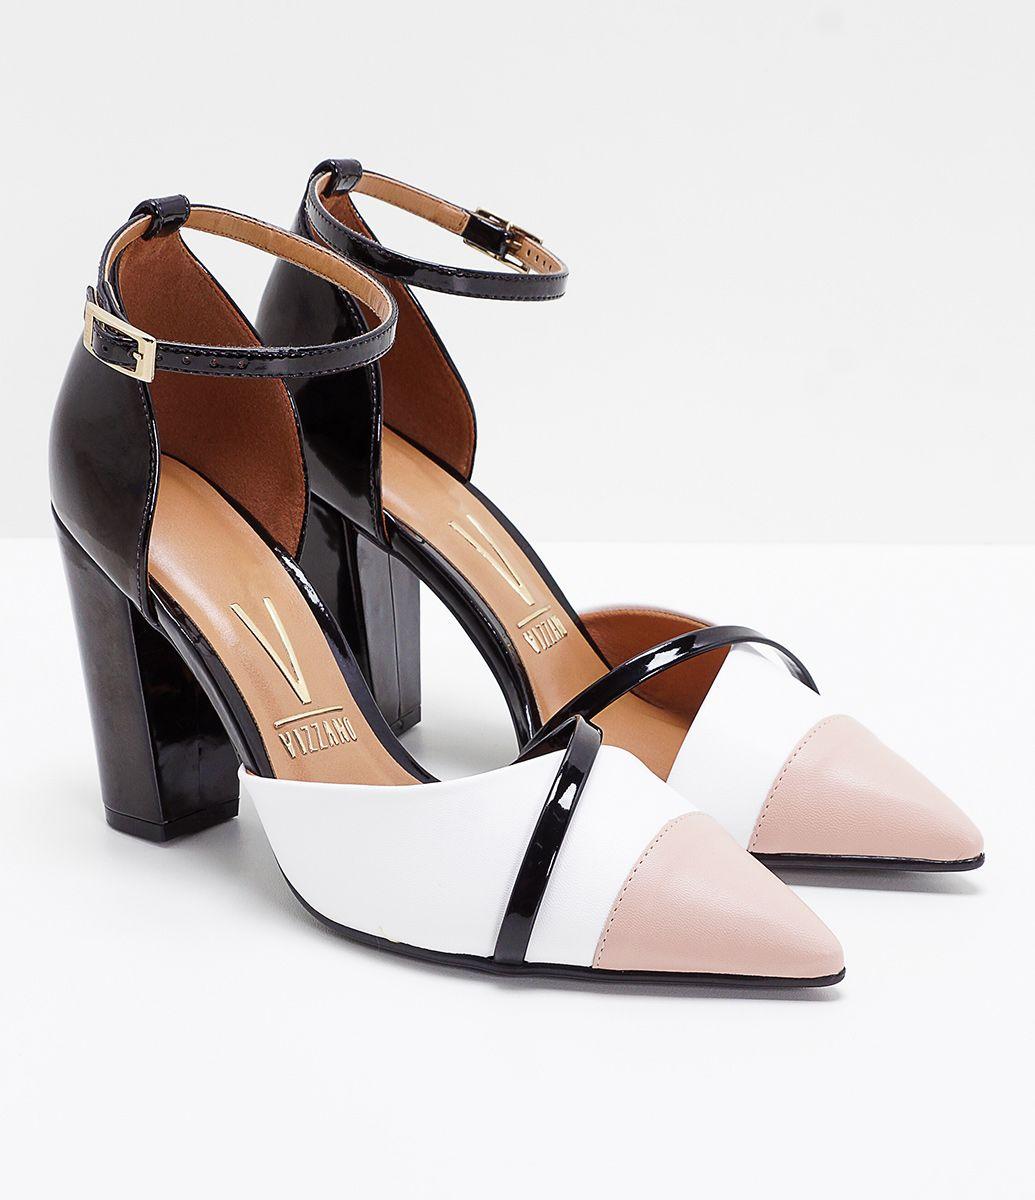 5cad6c6466 Sapato feminino Material  sintético Modelo scarpin Tricolor Marca  Vizzano Bico  fino Salto grosso COLEÇÃO